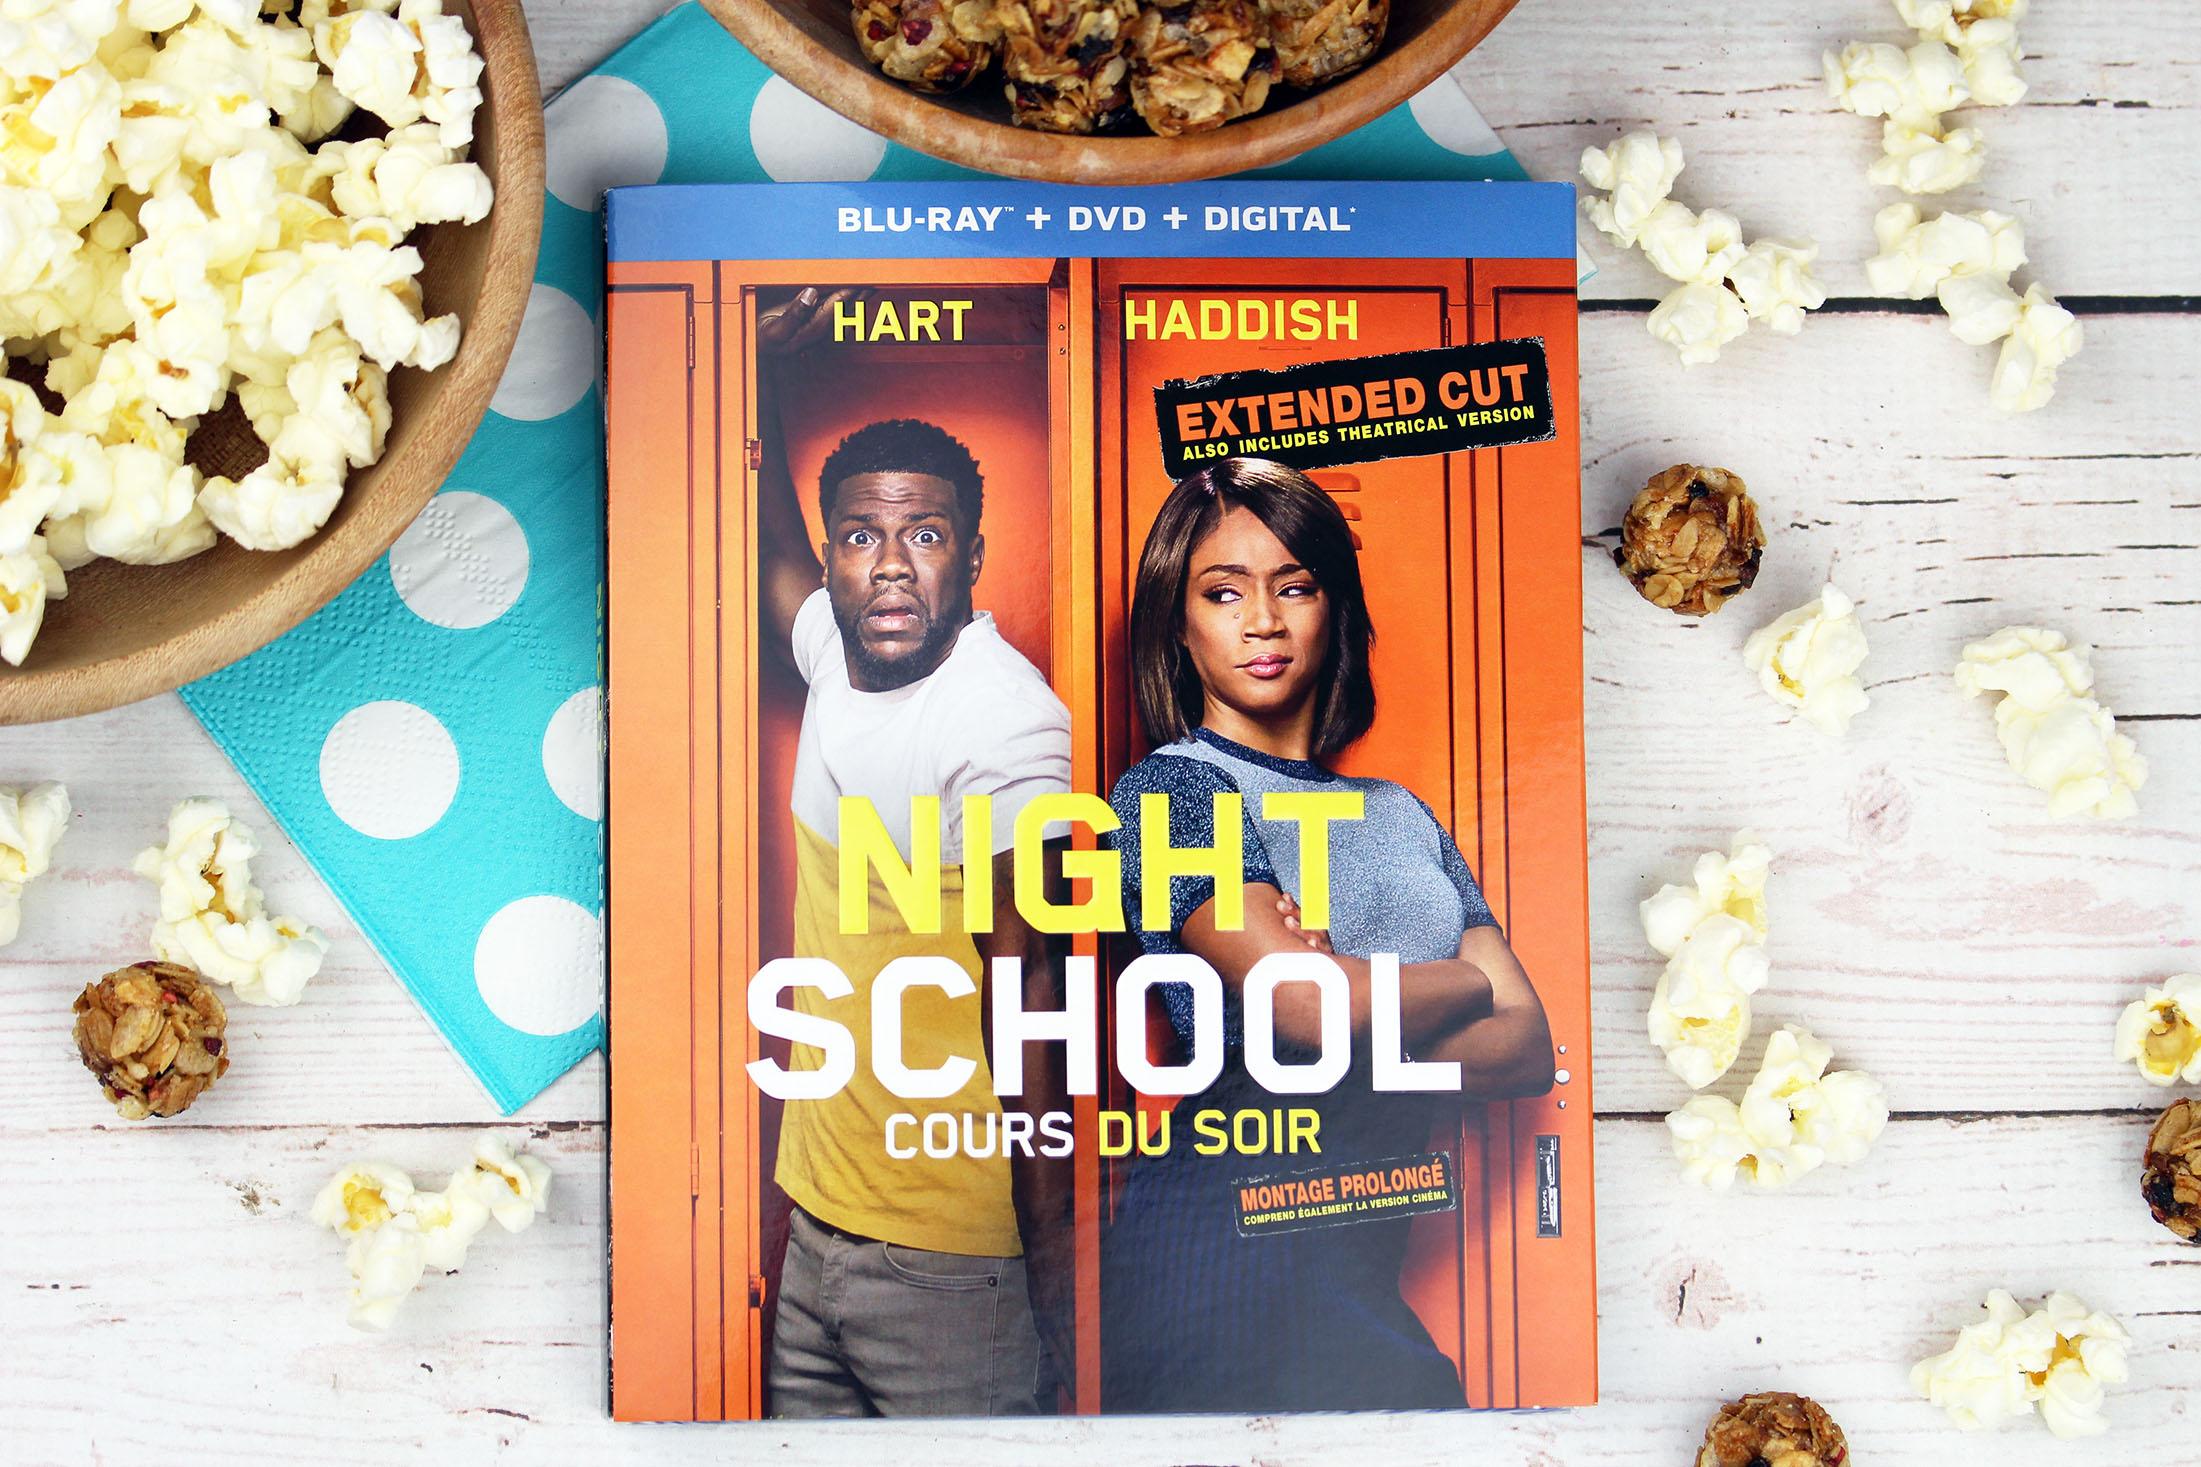 Night School with Kevin Hart and Tiffany Haddish